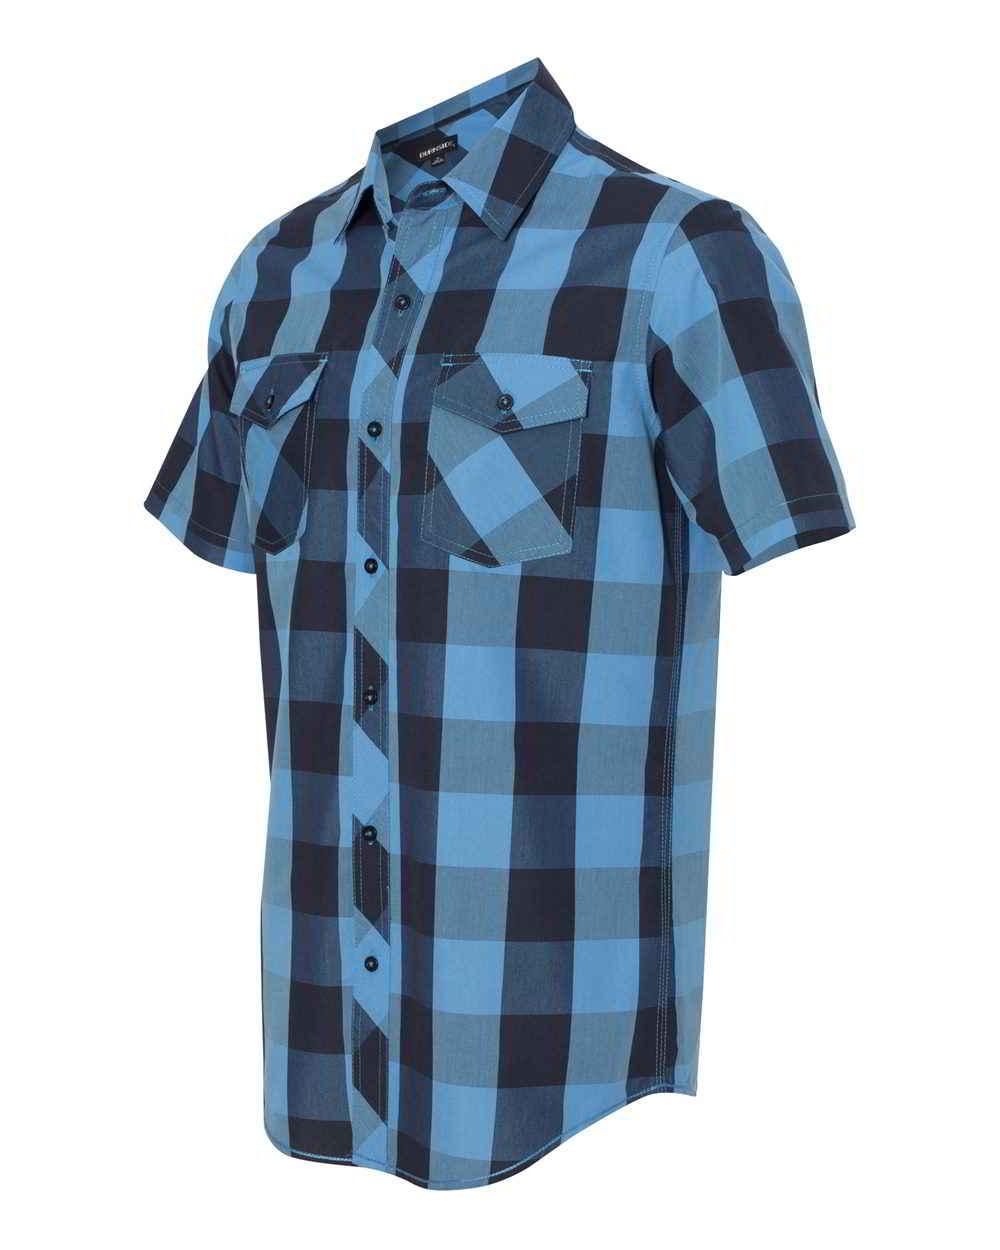 Burnside Mens Button Up Tops Buffalo Plaid Short Sleeve Shirt | eBay